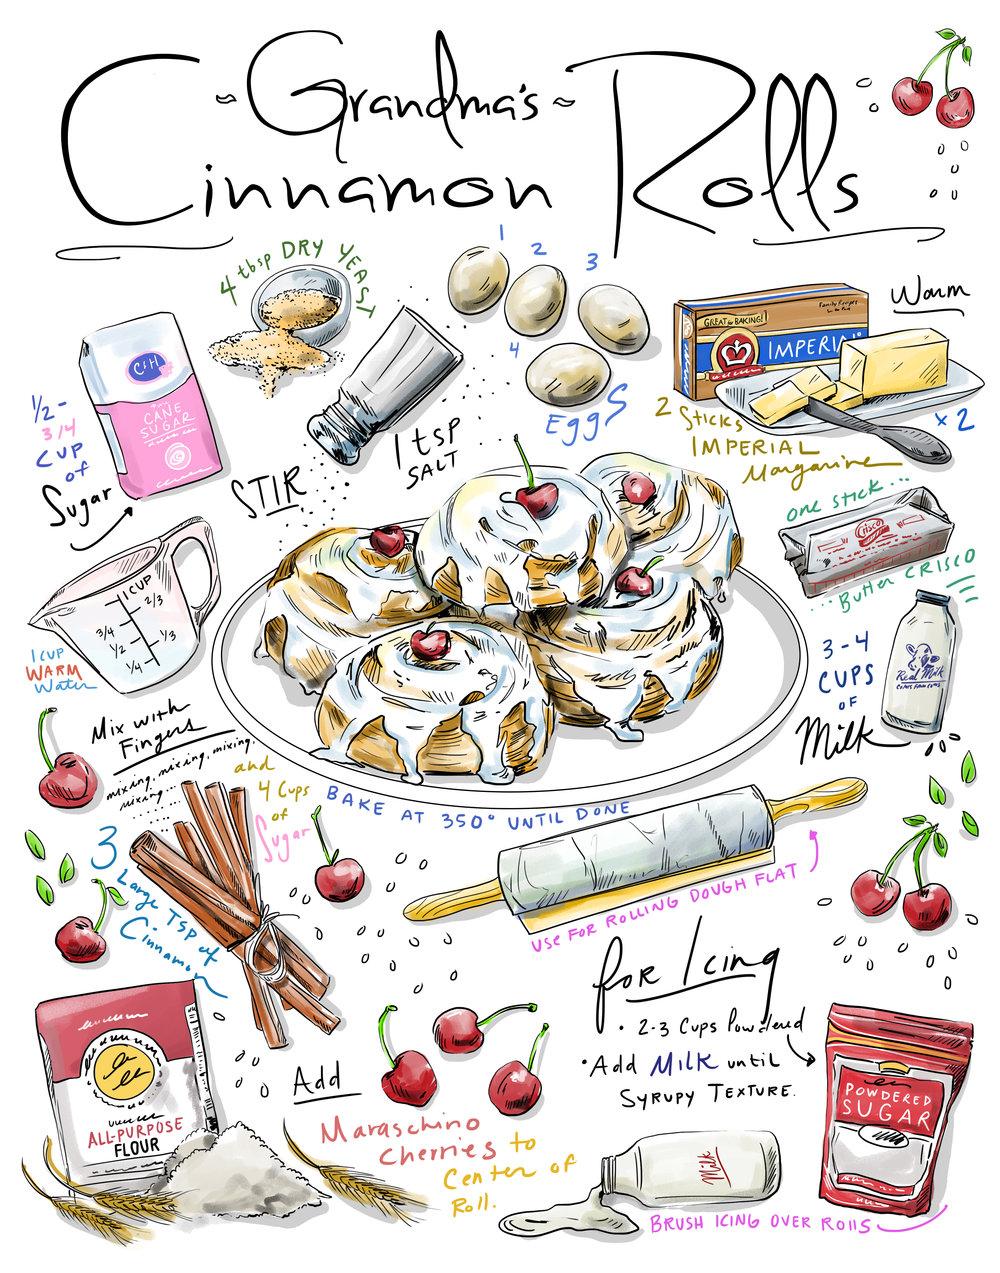 Grandmas Cinnamon Rolls.jpg